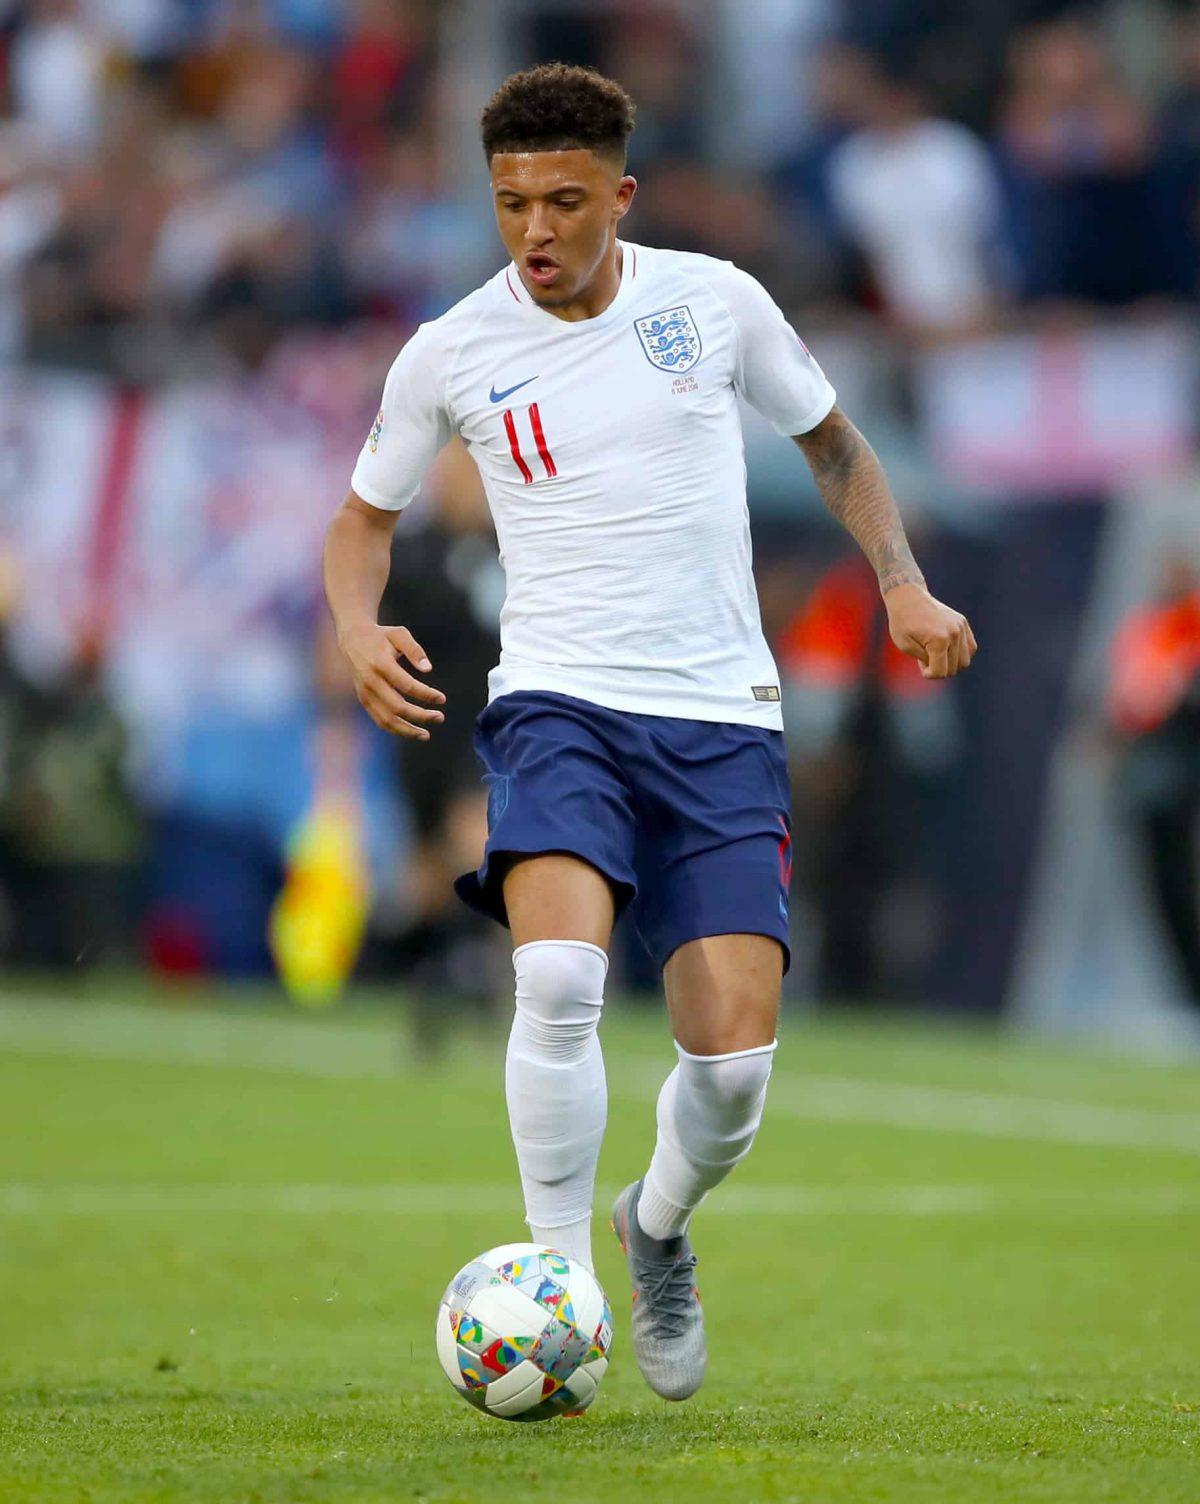 England's Jadon Sancho